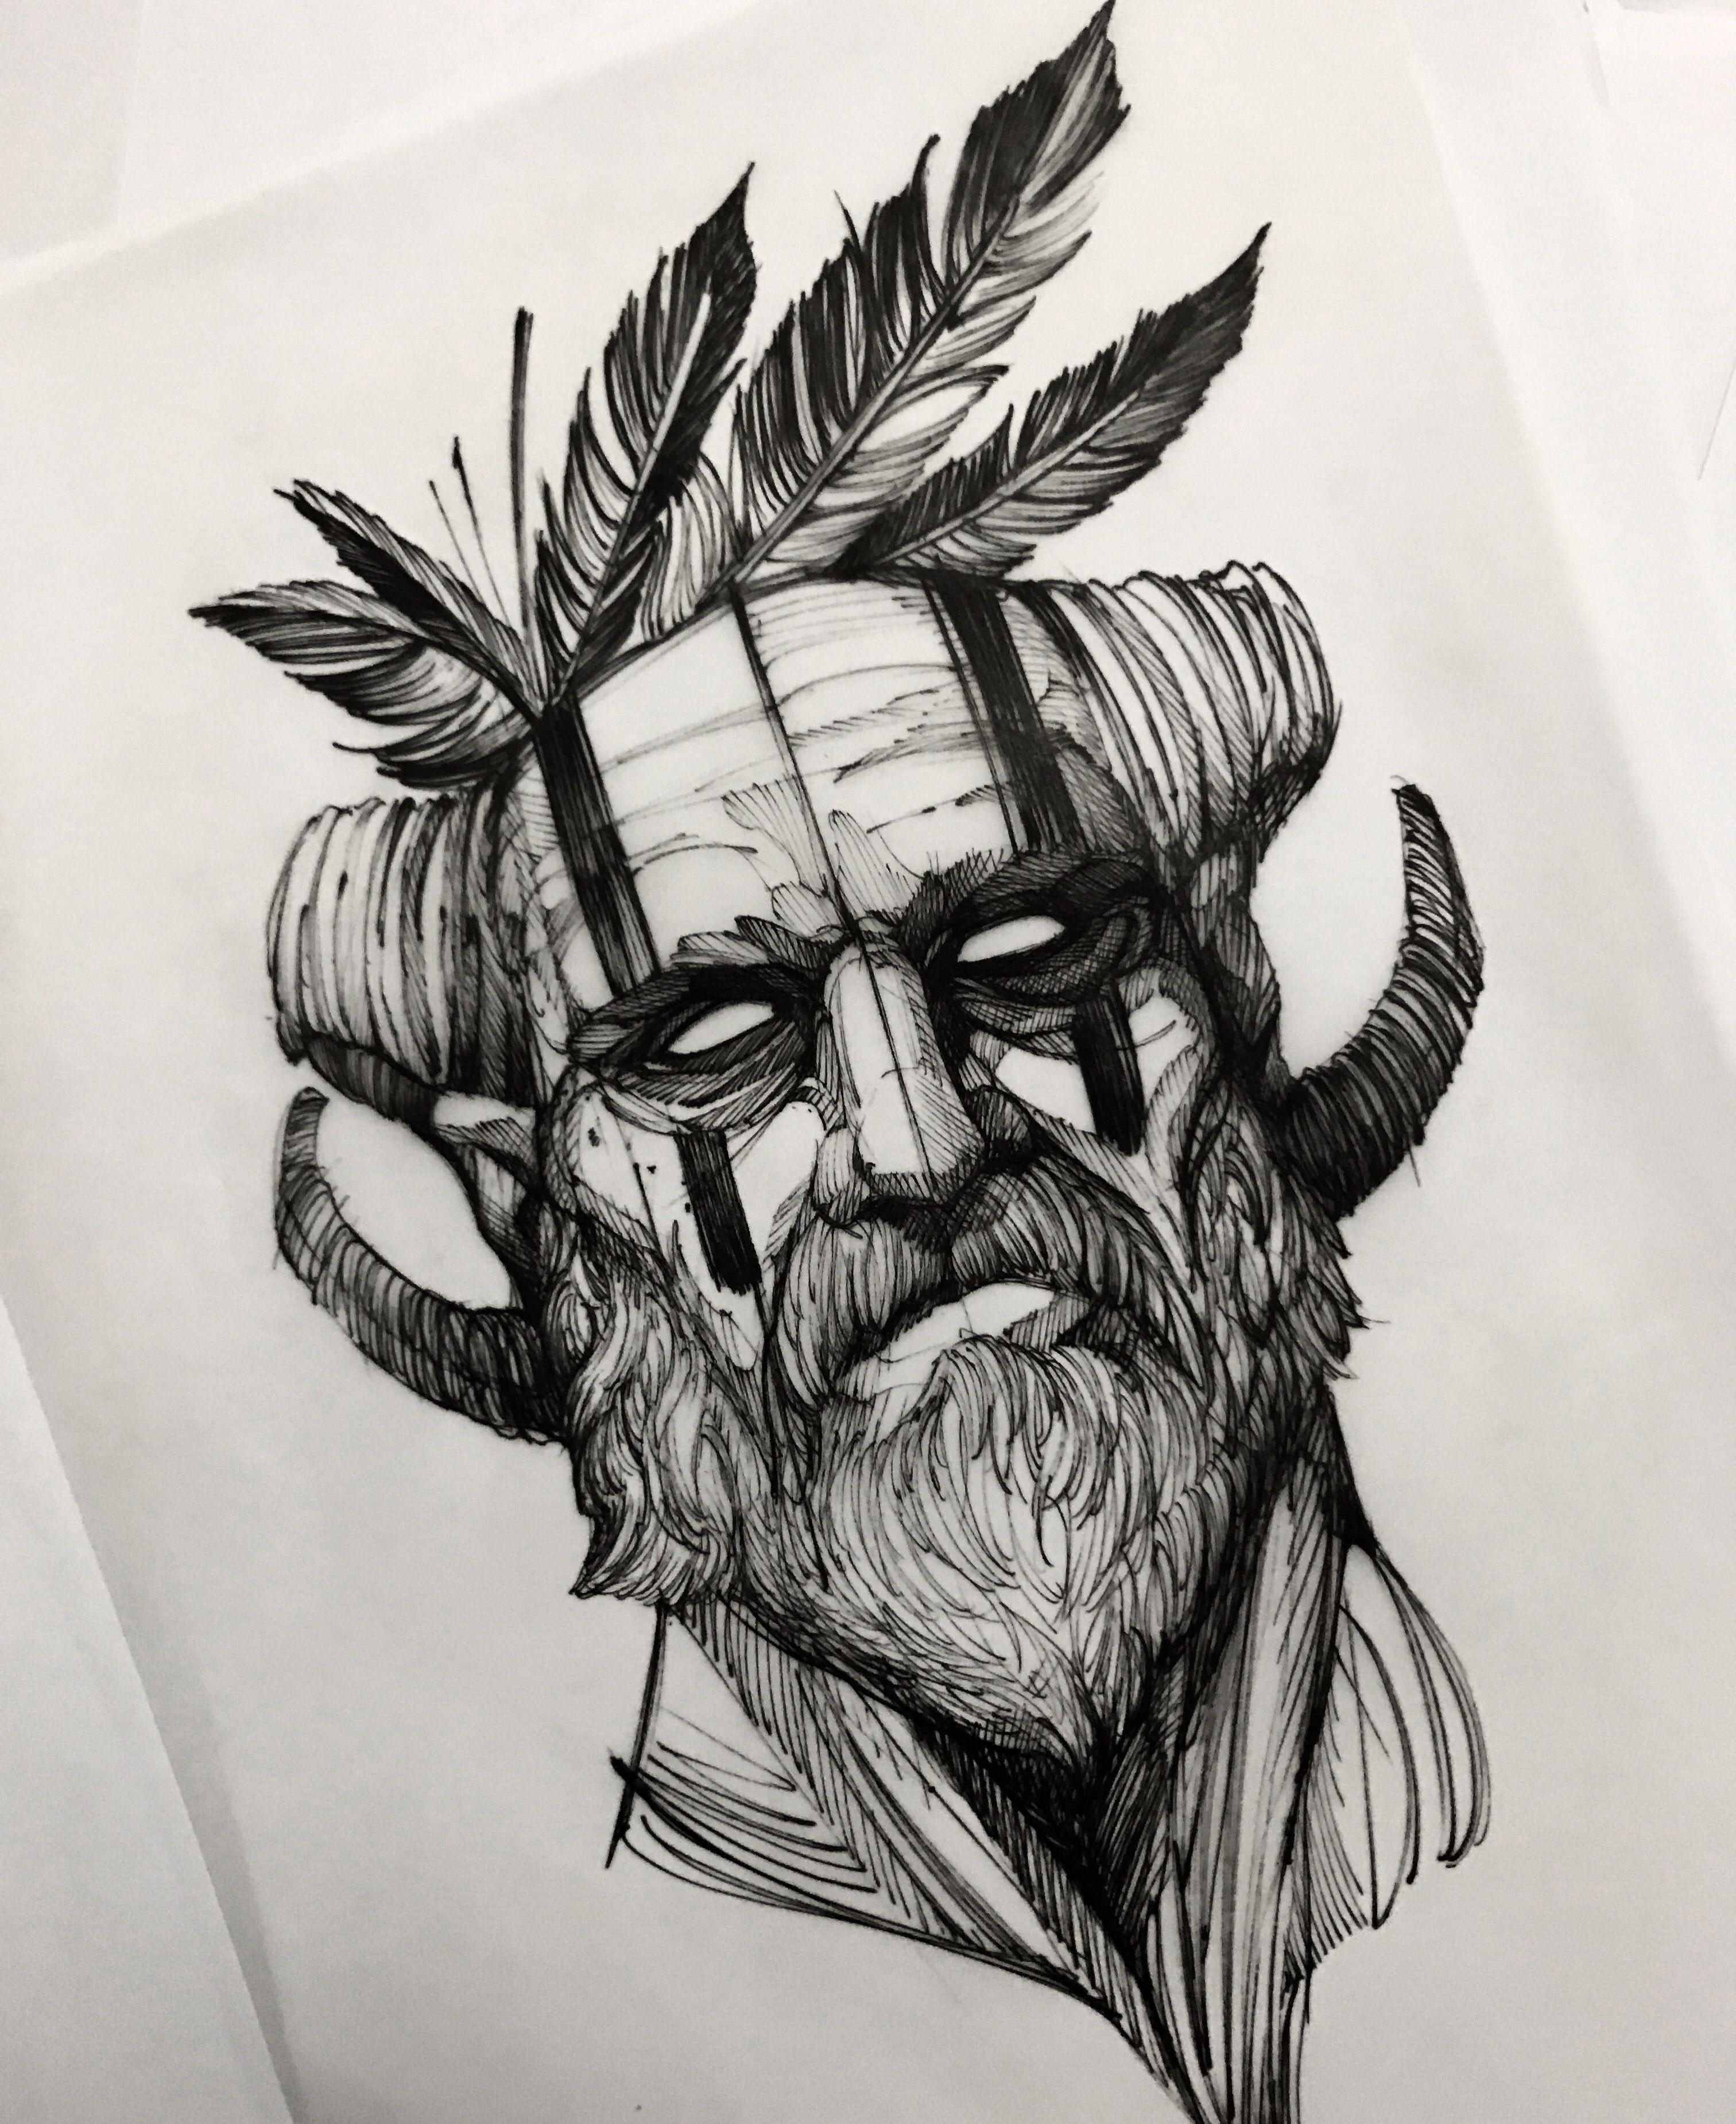 Fredao Oliveira Desenho Tattoo Ideas 문신 그림 문신 문신 아이디어